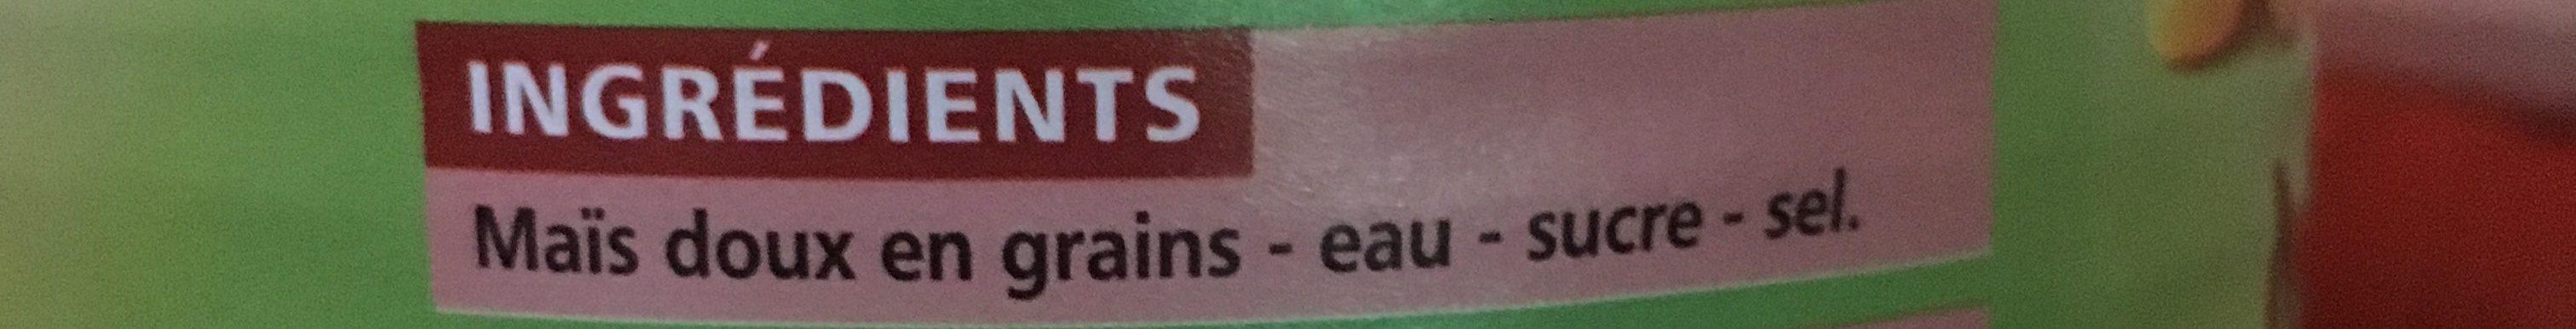 Maïs croquant - Ingredients